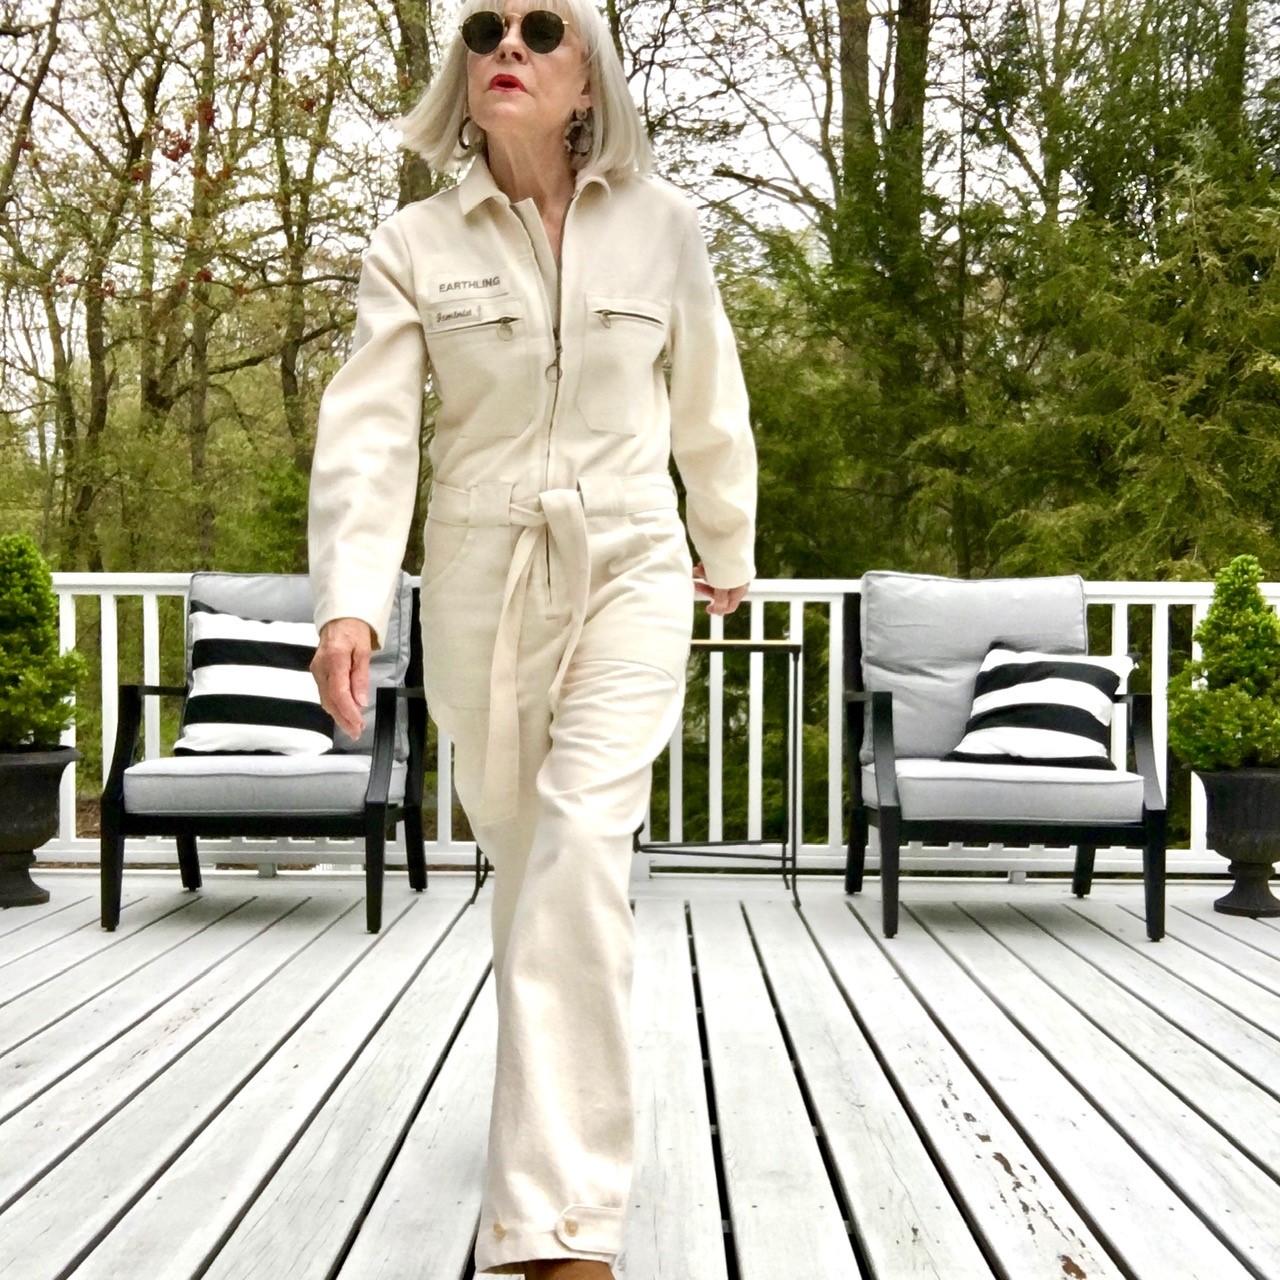 Blanca of @blakandblanca in an off-white jumpsuit